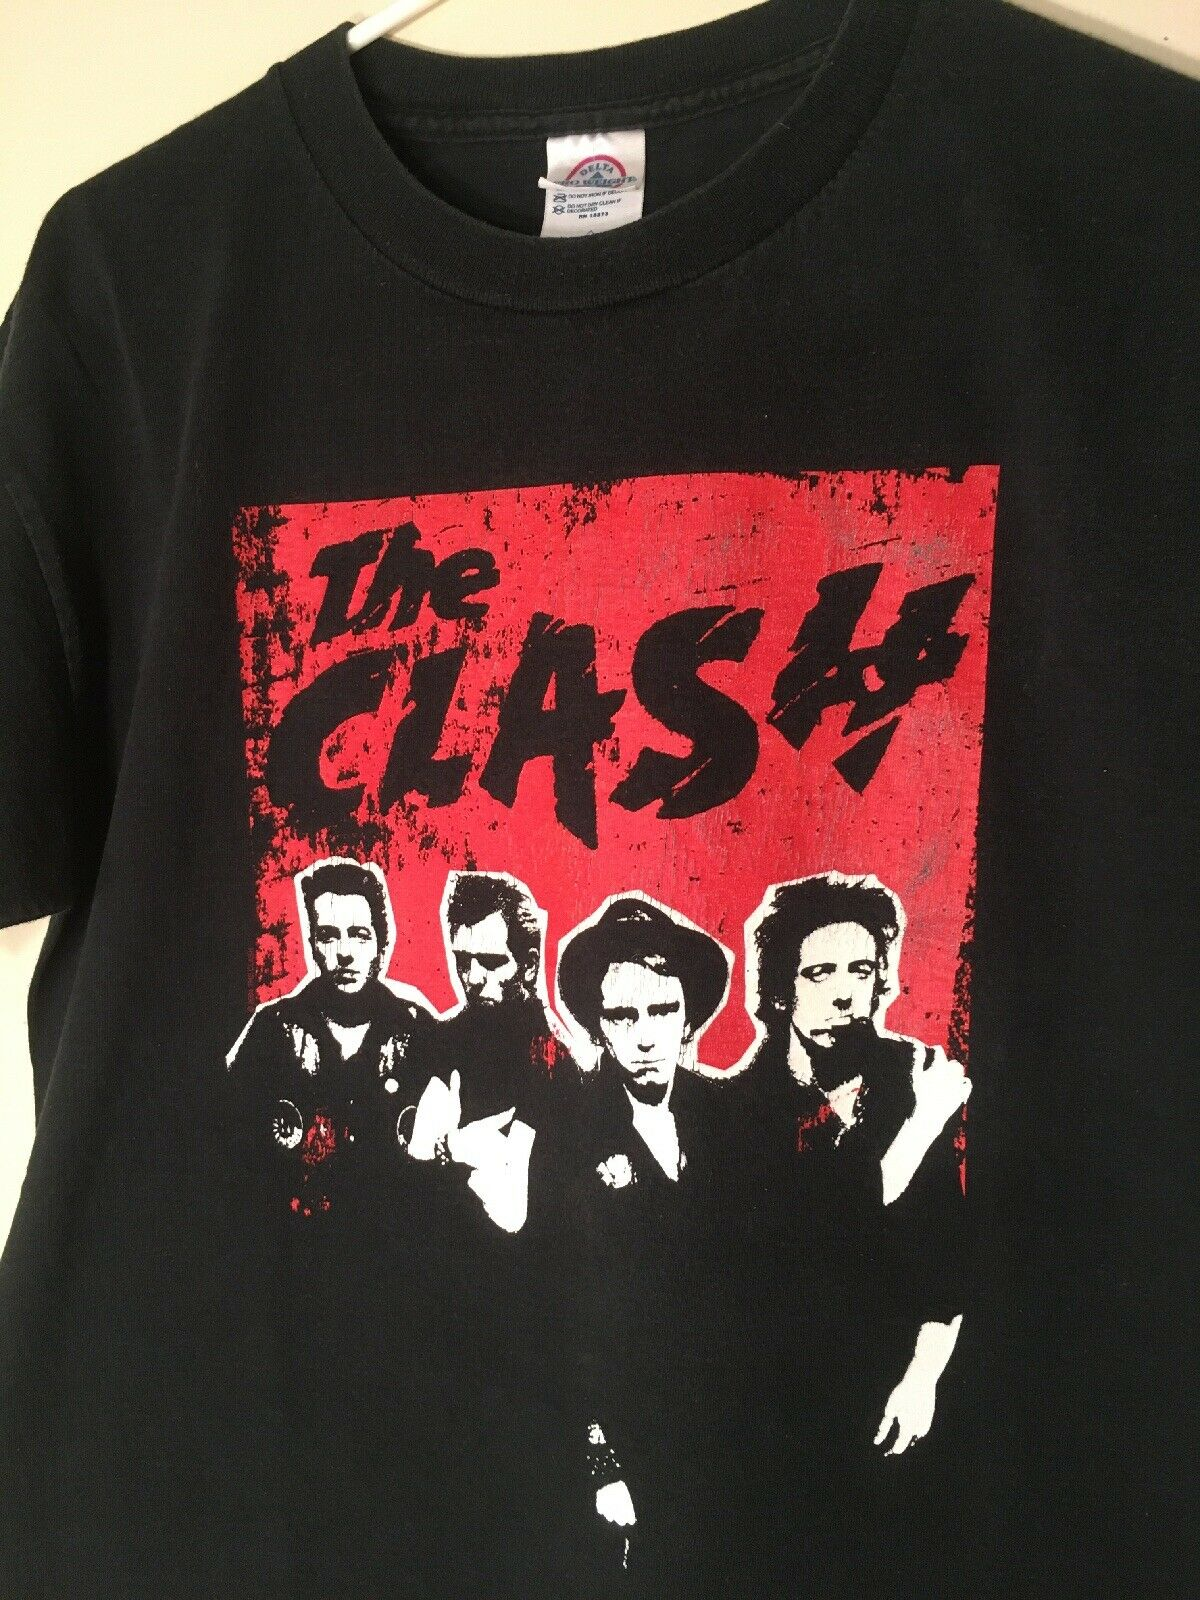 2004 The Clash Promo T-shirt M Punk Rock  - image 1